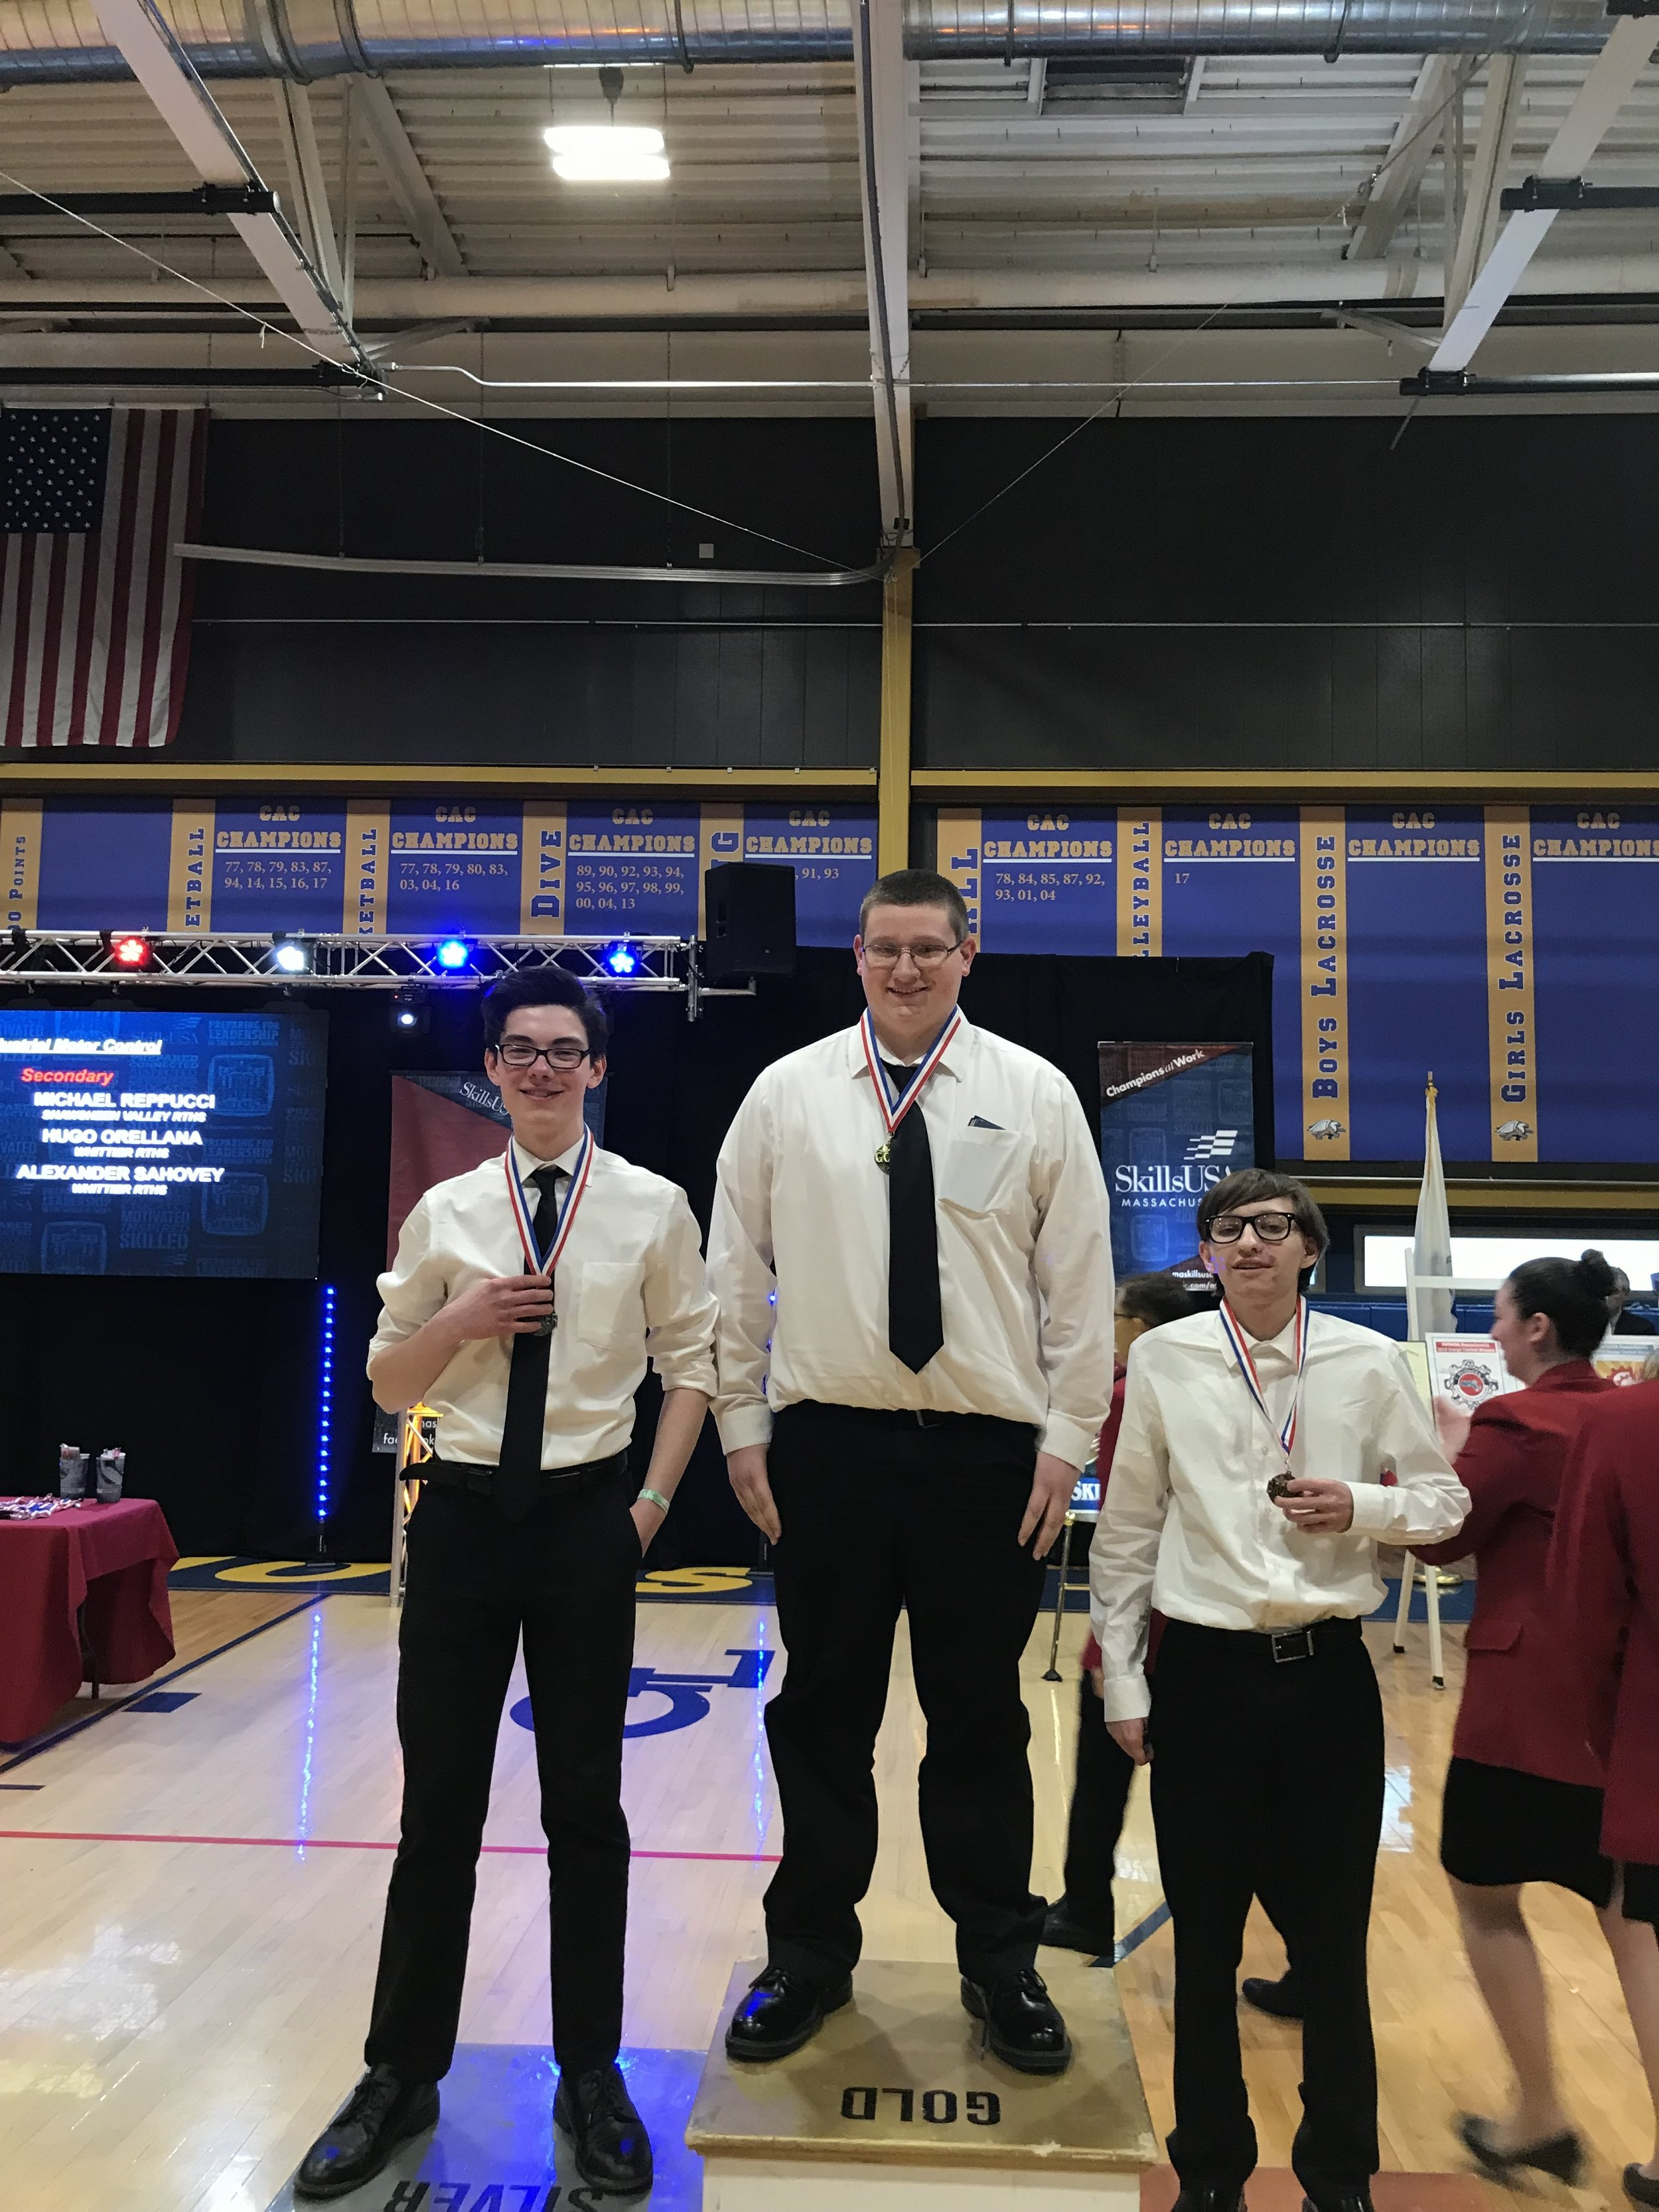 skills boys with ties.JPG